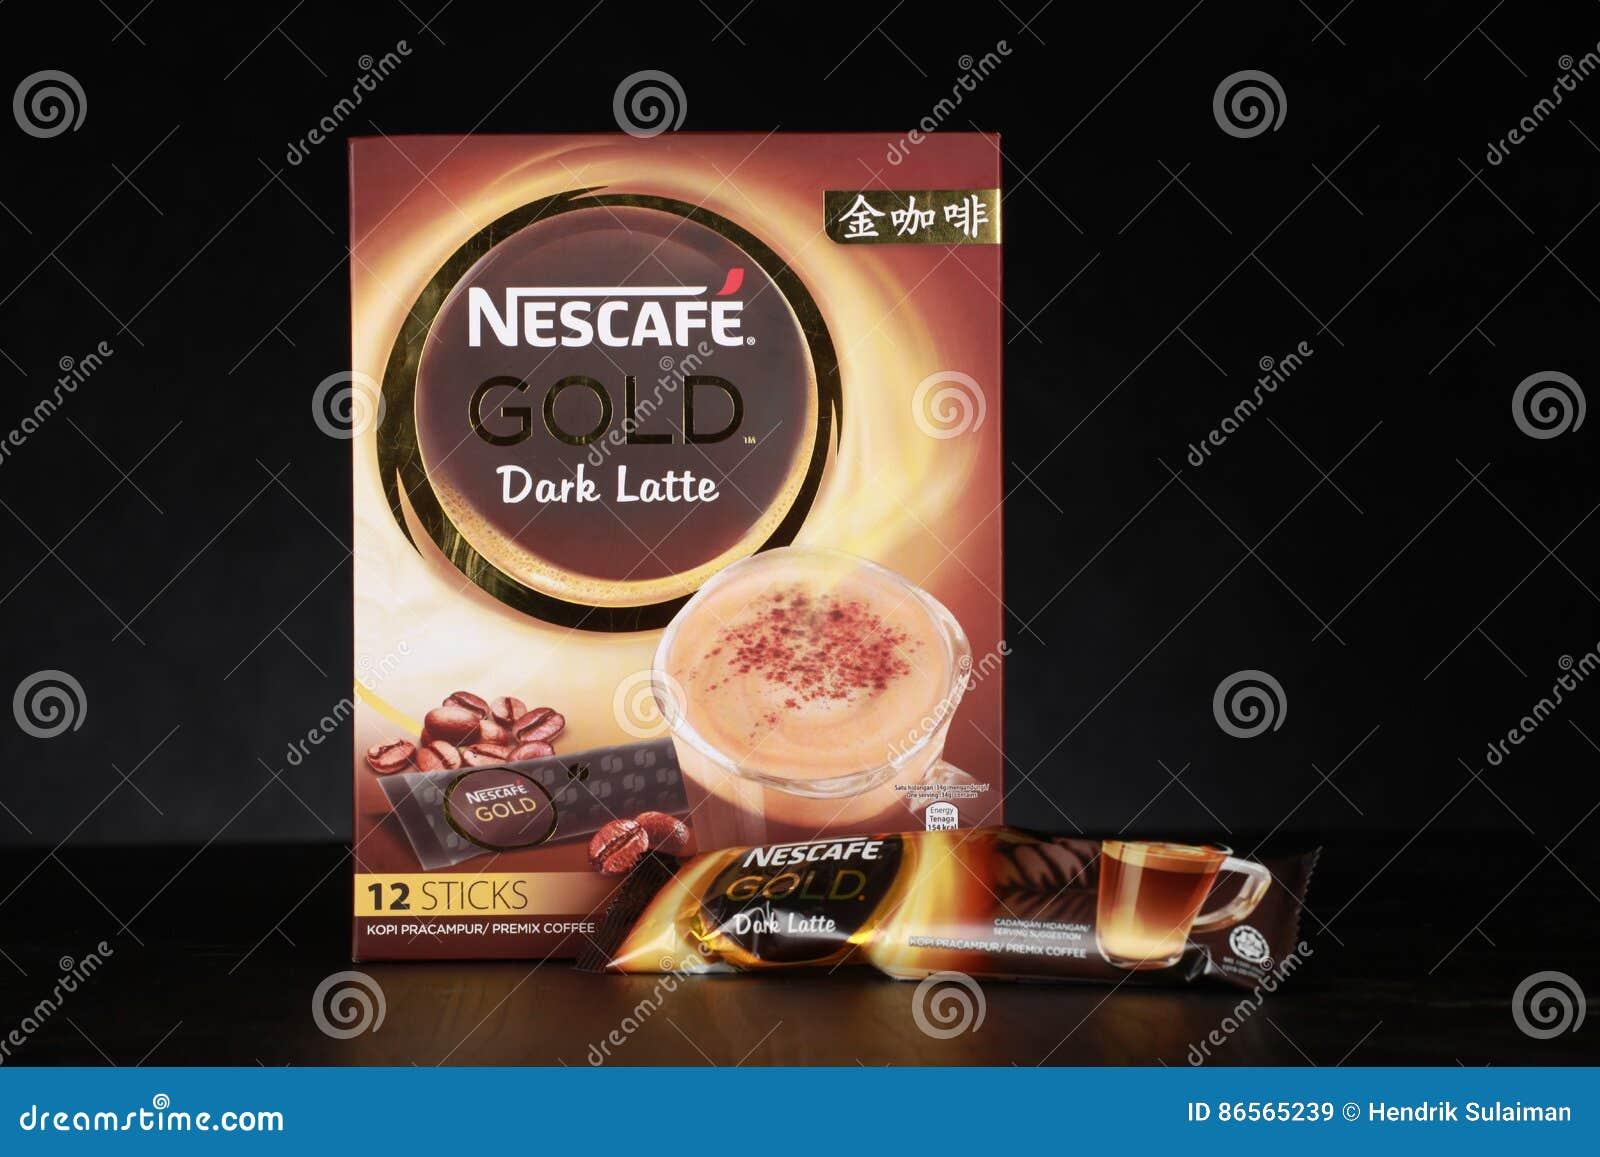 Tempat Jual Nescafe Gold White Coffee Terbaru 2018 Tas Fashion Import Ysbj4866black Drink Product Shot Editorial Stock Image Of Shah Alam Malaysia February 17